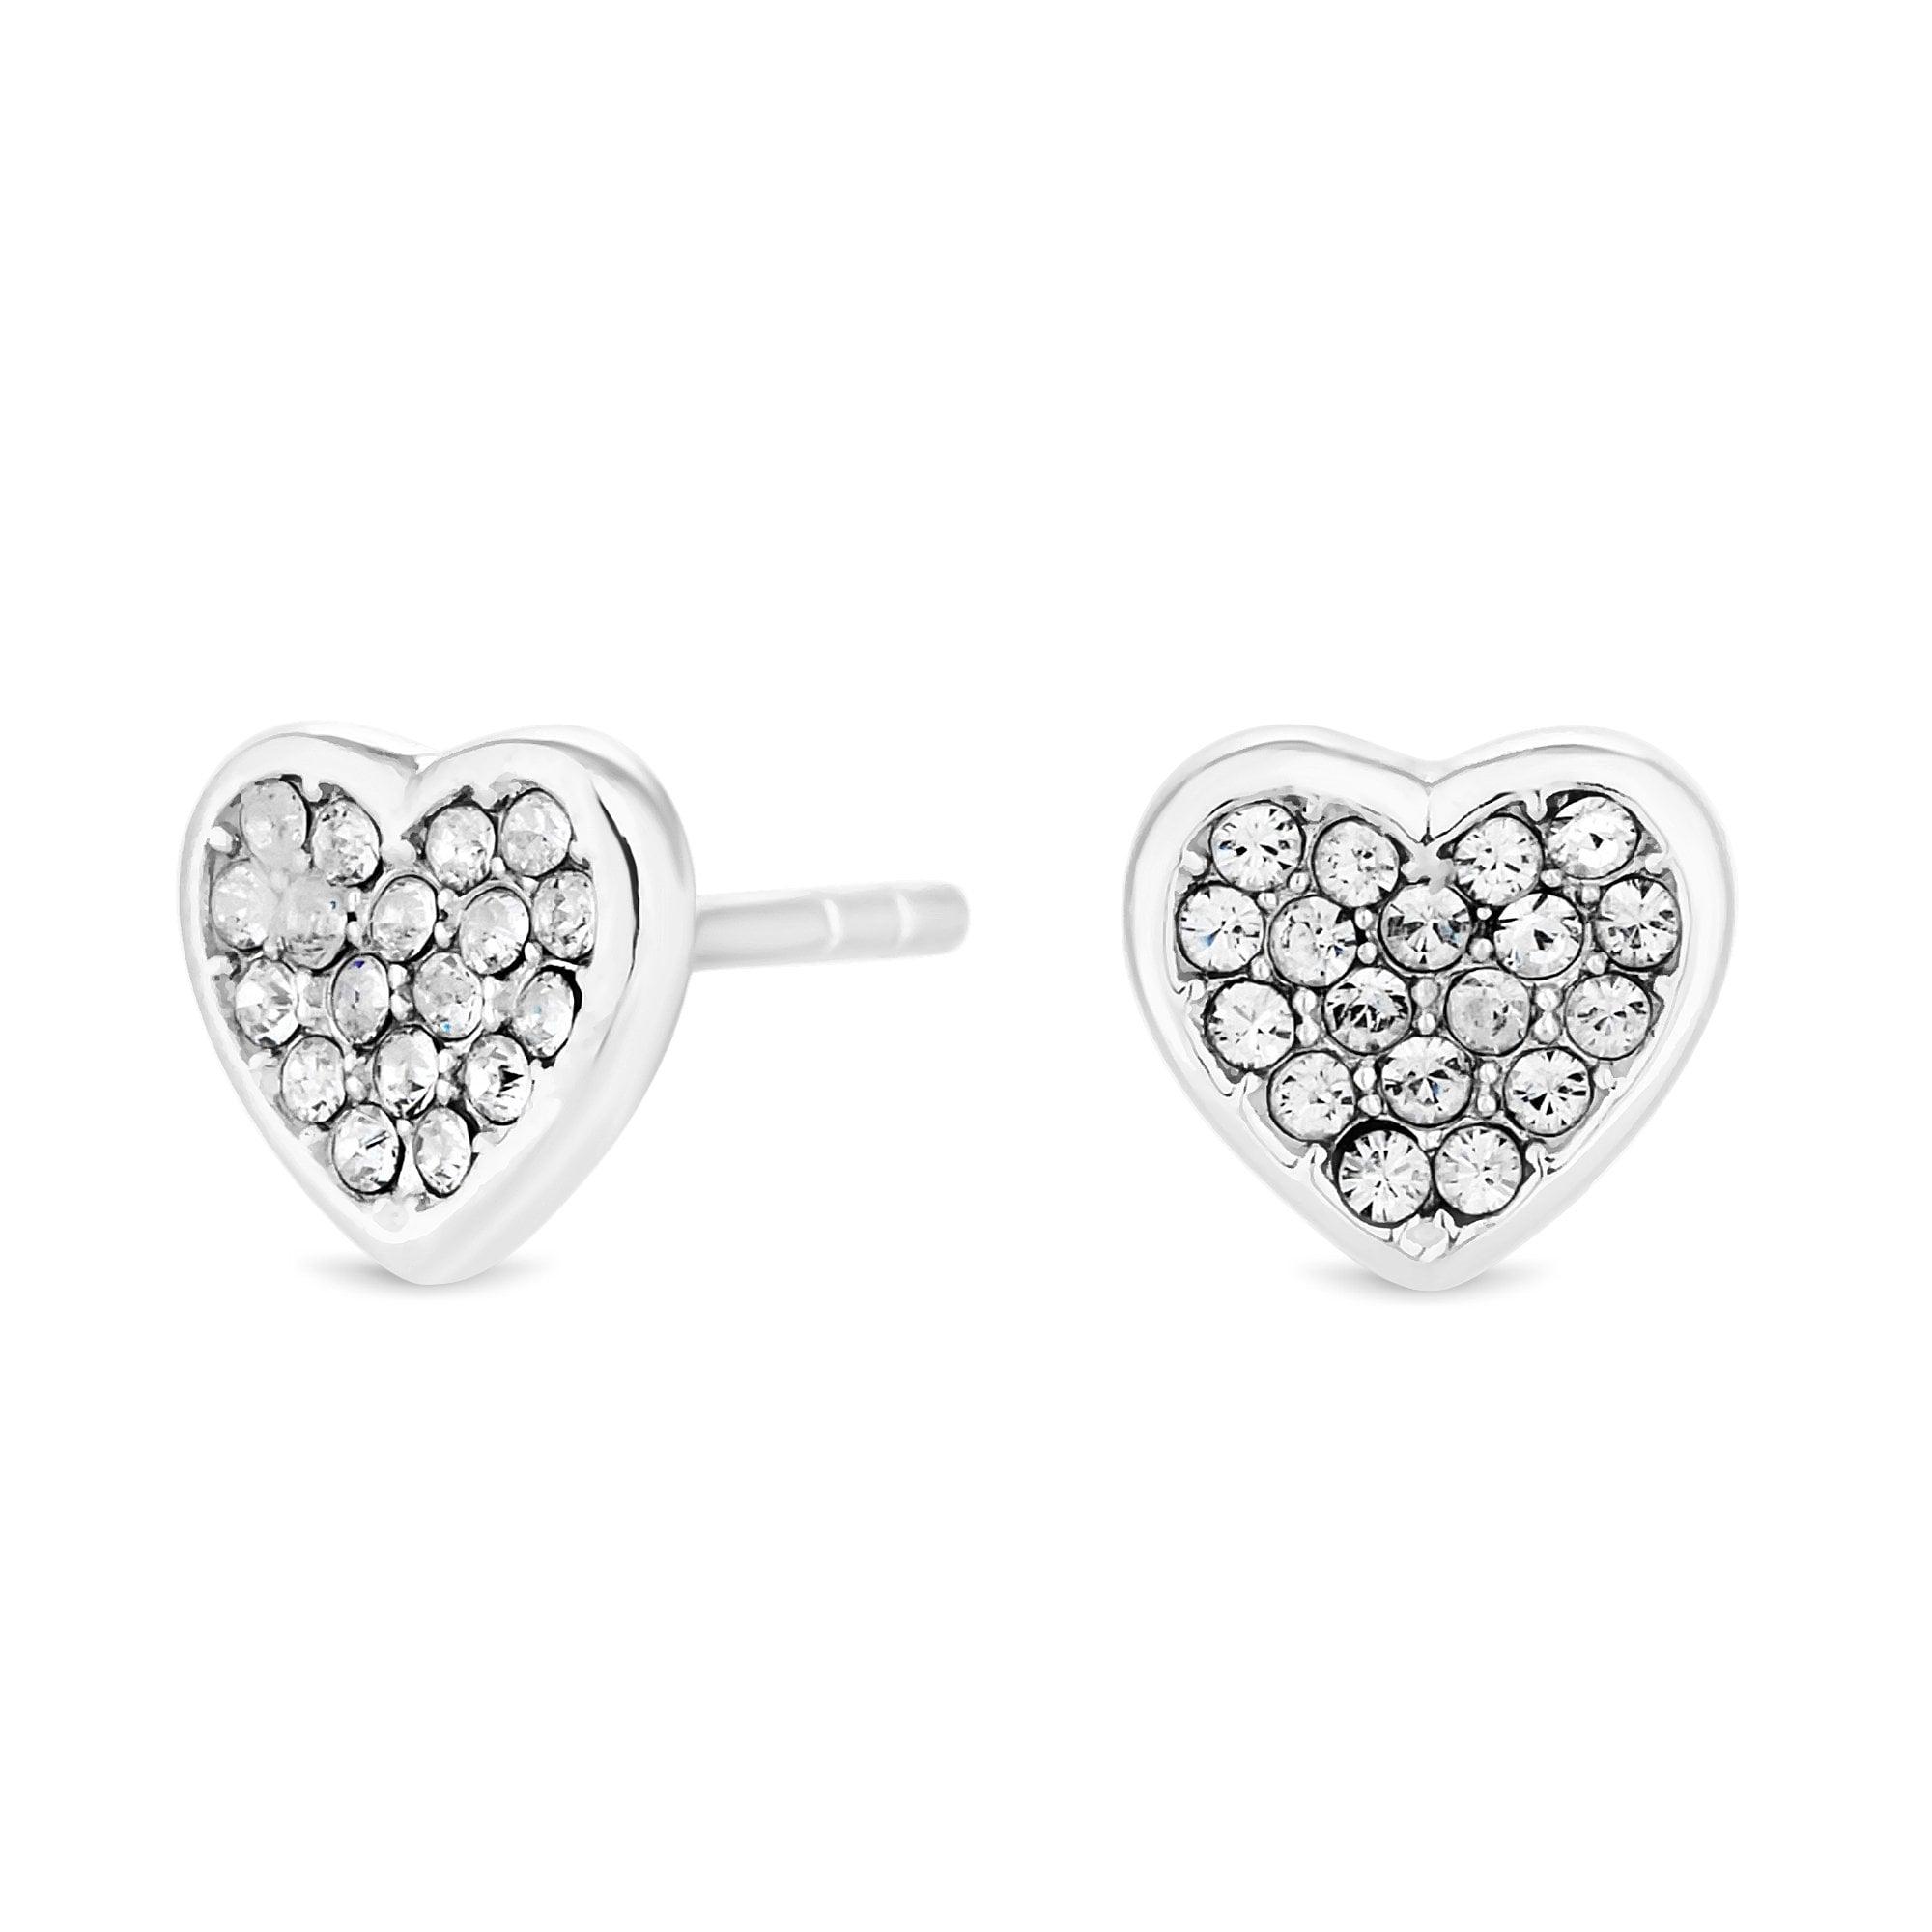 Simply Silver Sterling Silver 925 Clear Swarovski Heart Stud Earring ... c09a7d2040